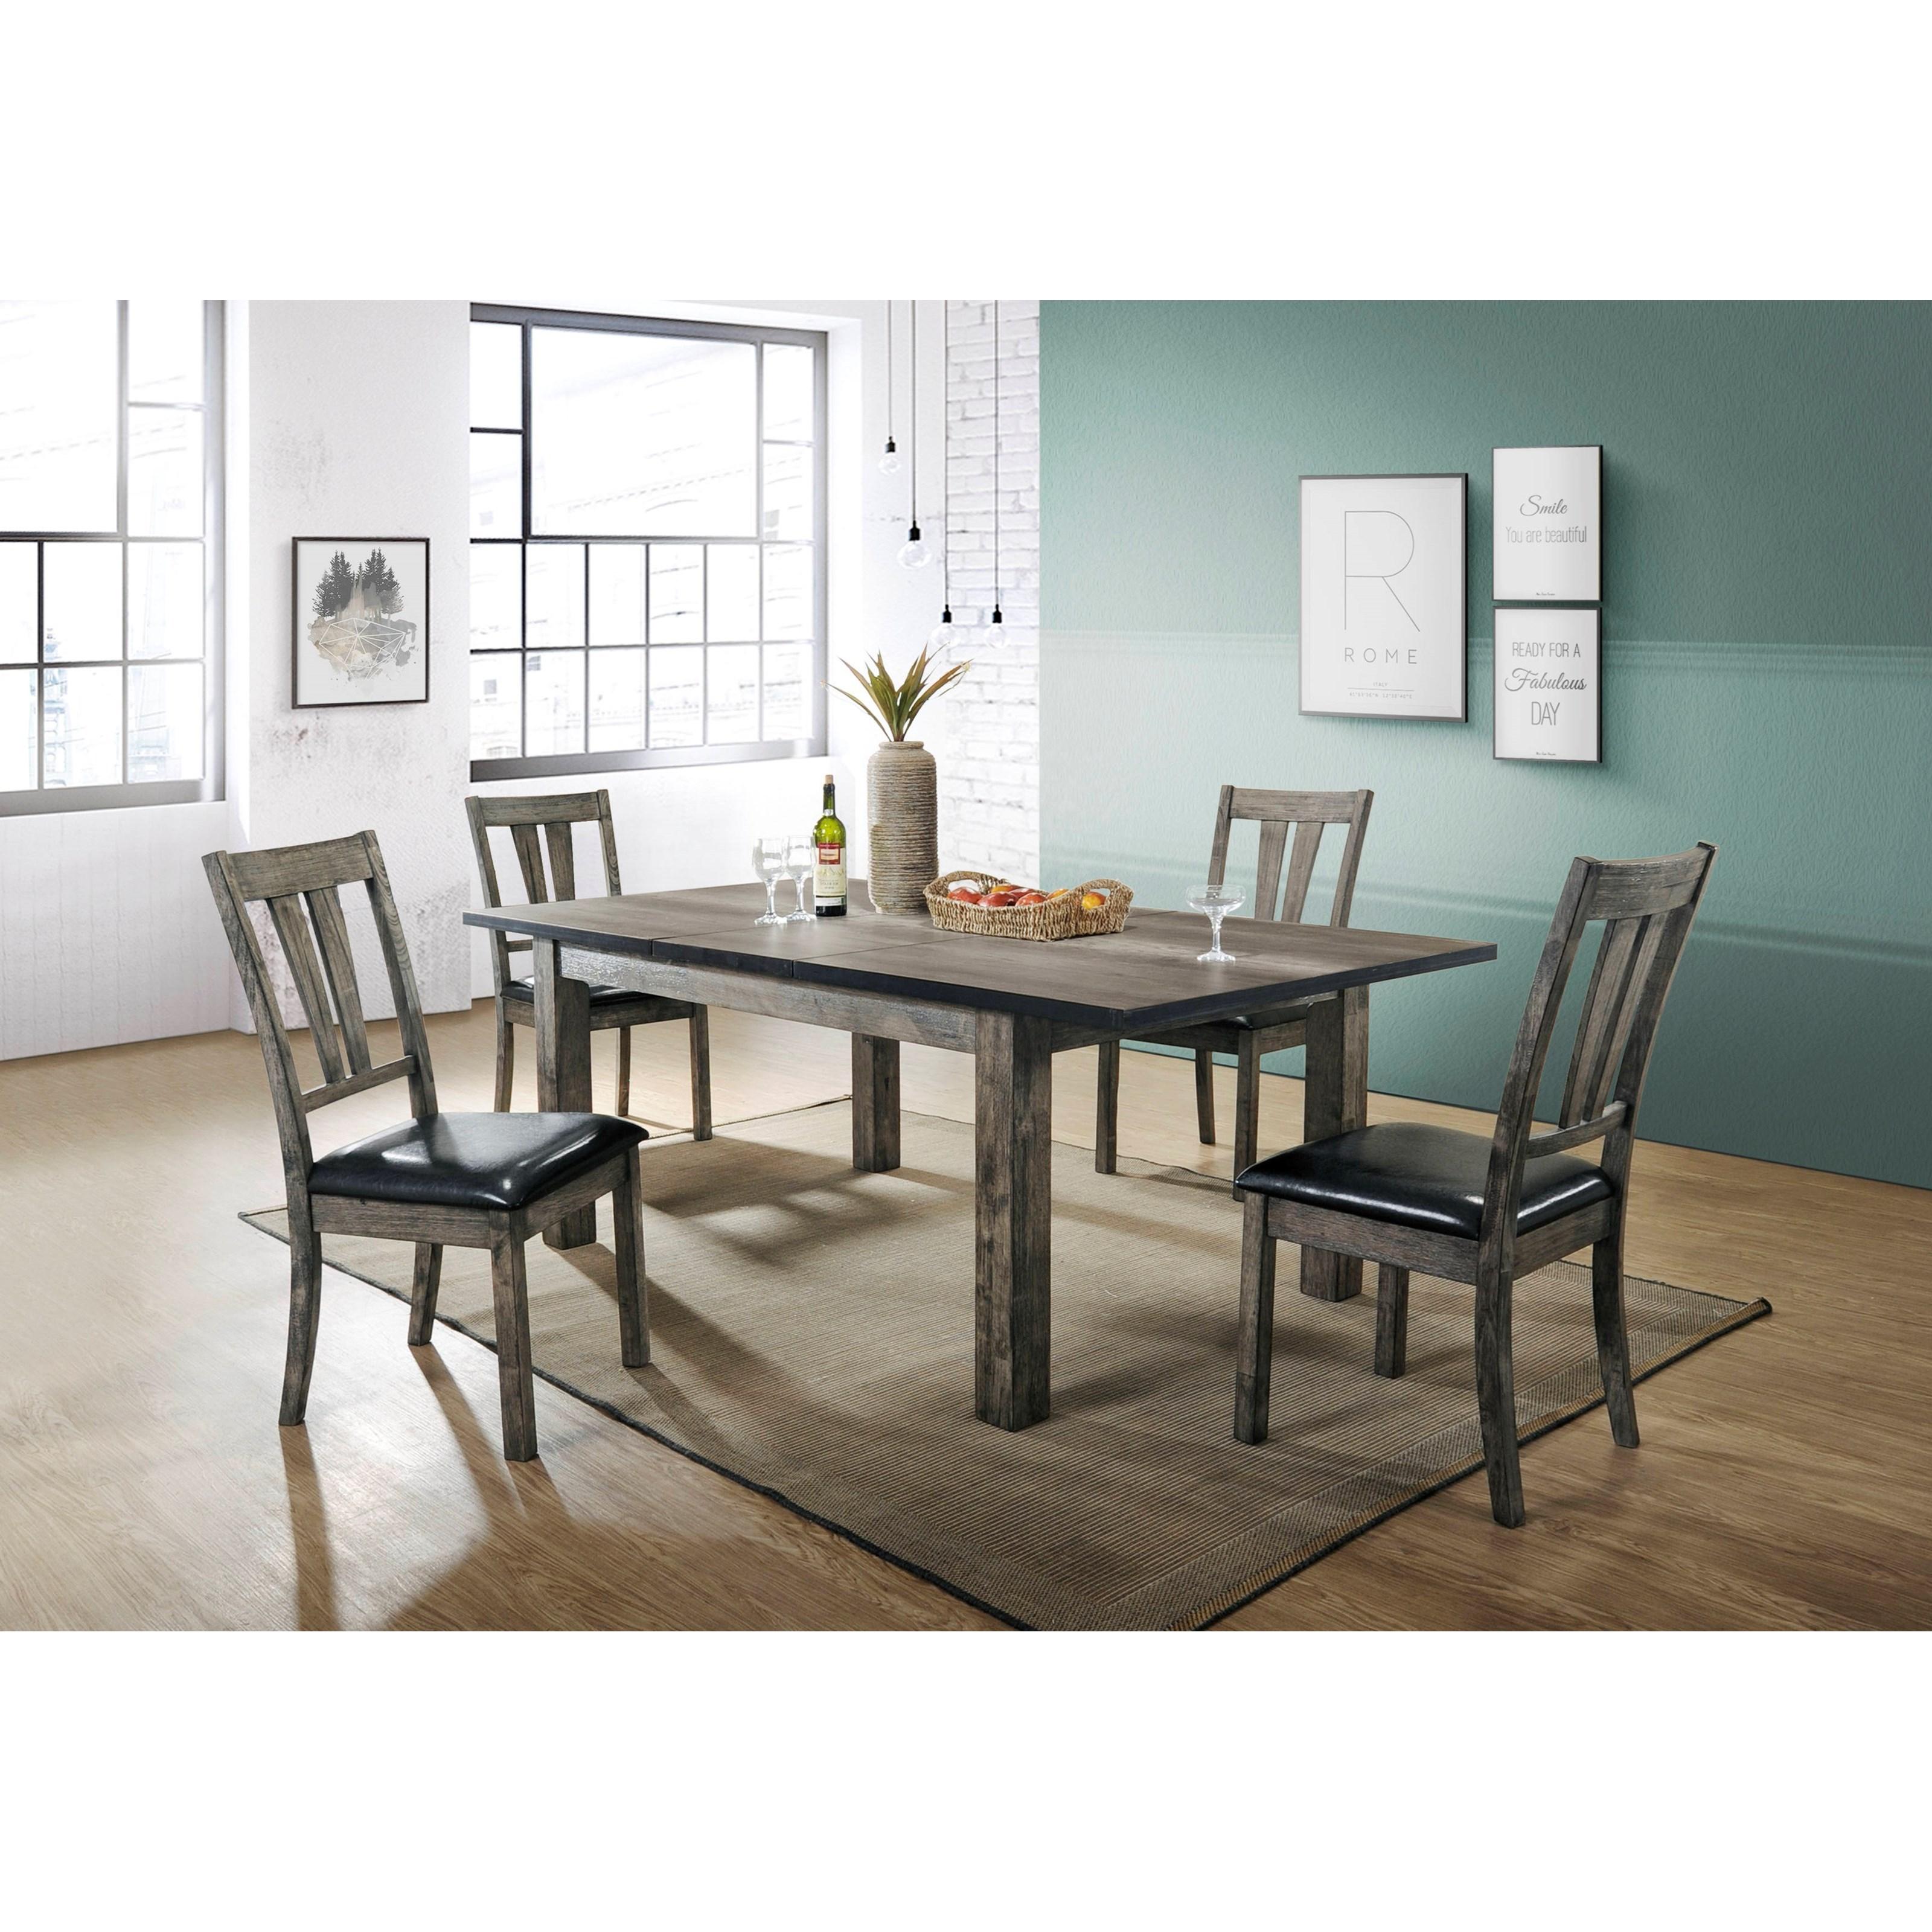 Beckman 5-Piece Dining Set at Walker's Furniture